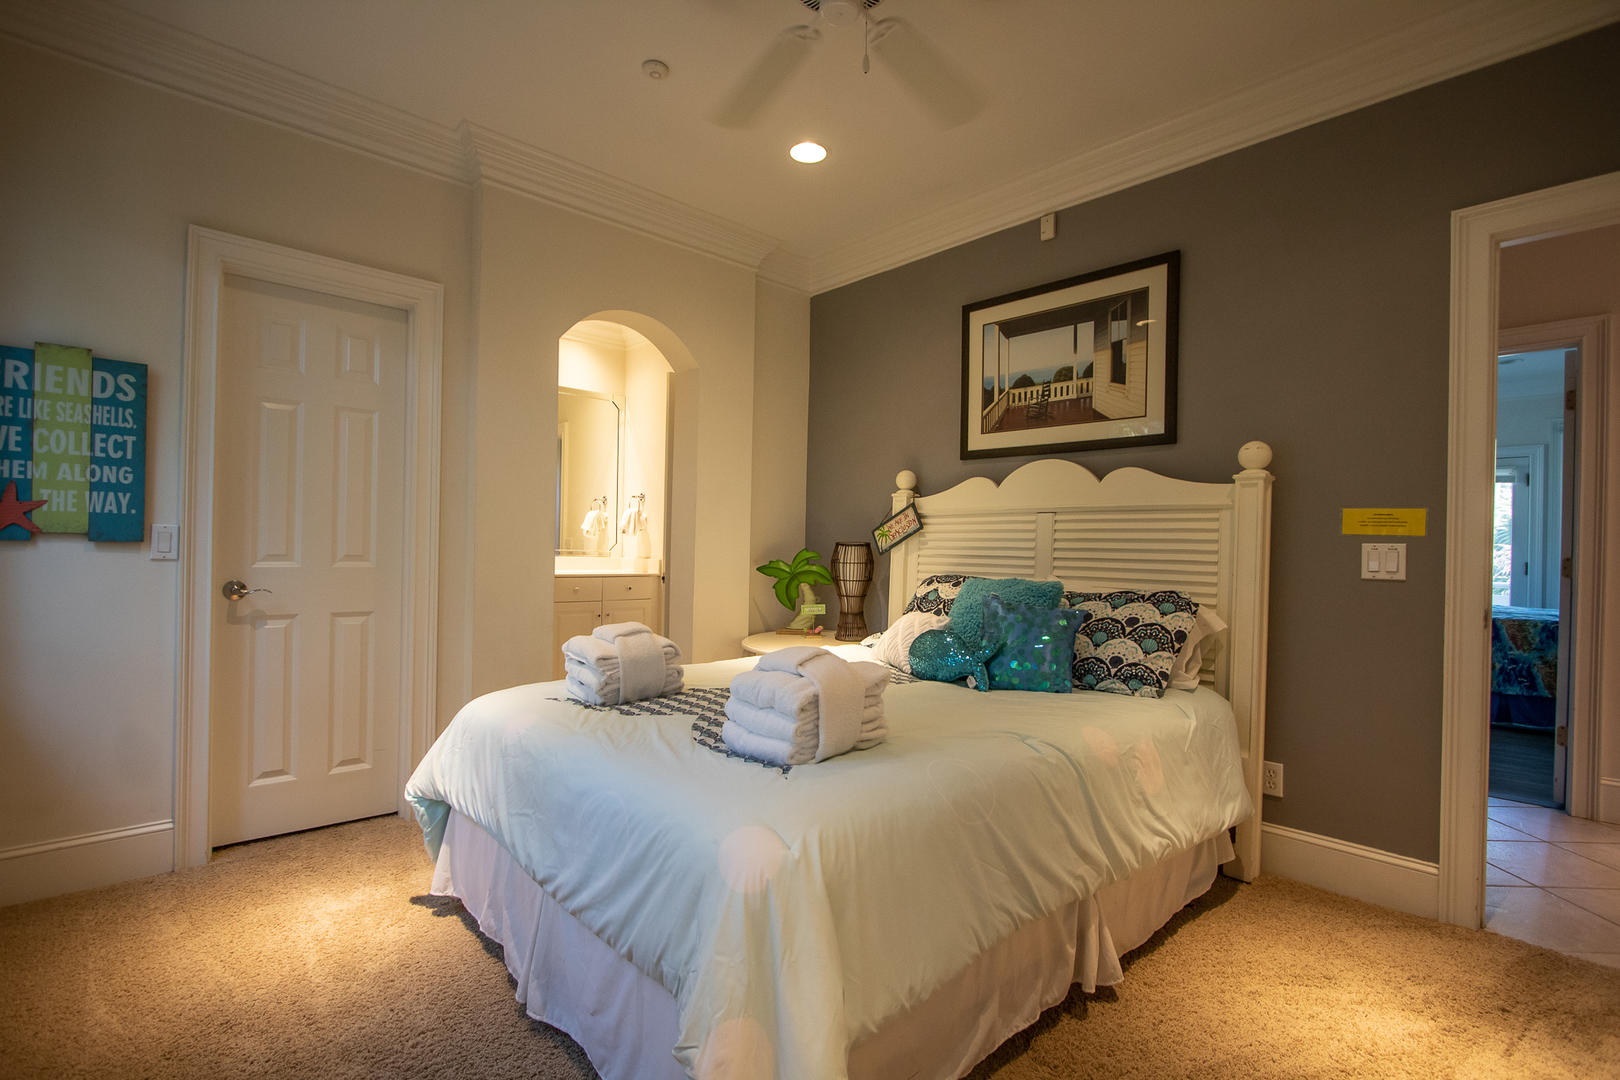 Bedroom 2, TV, jack and jill bath with bedroom 1